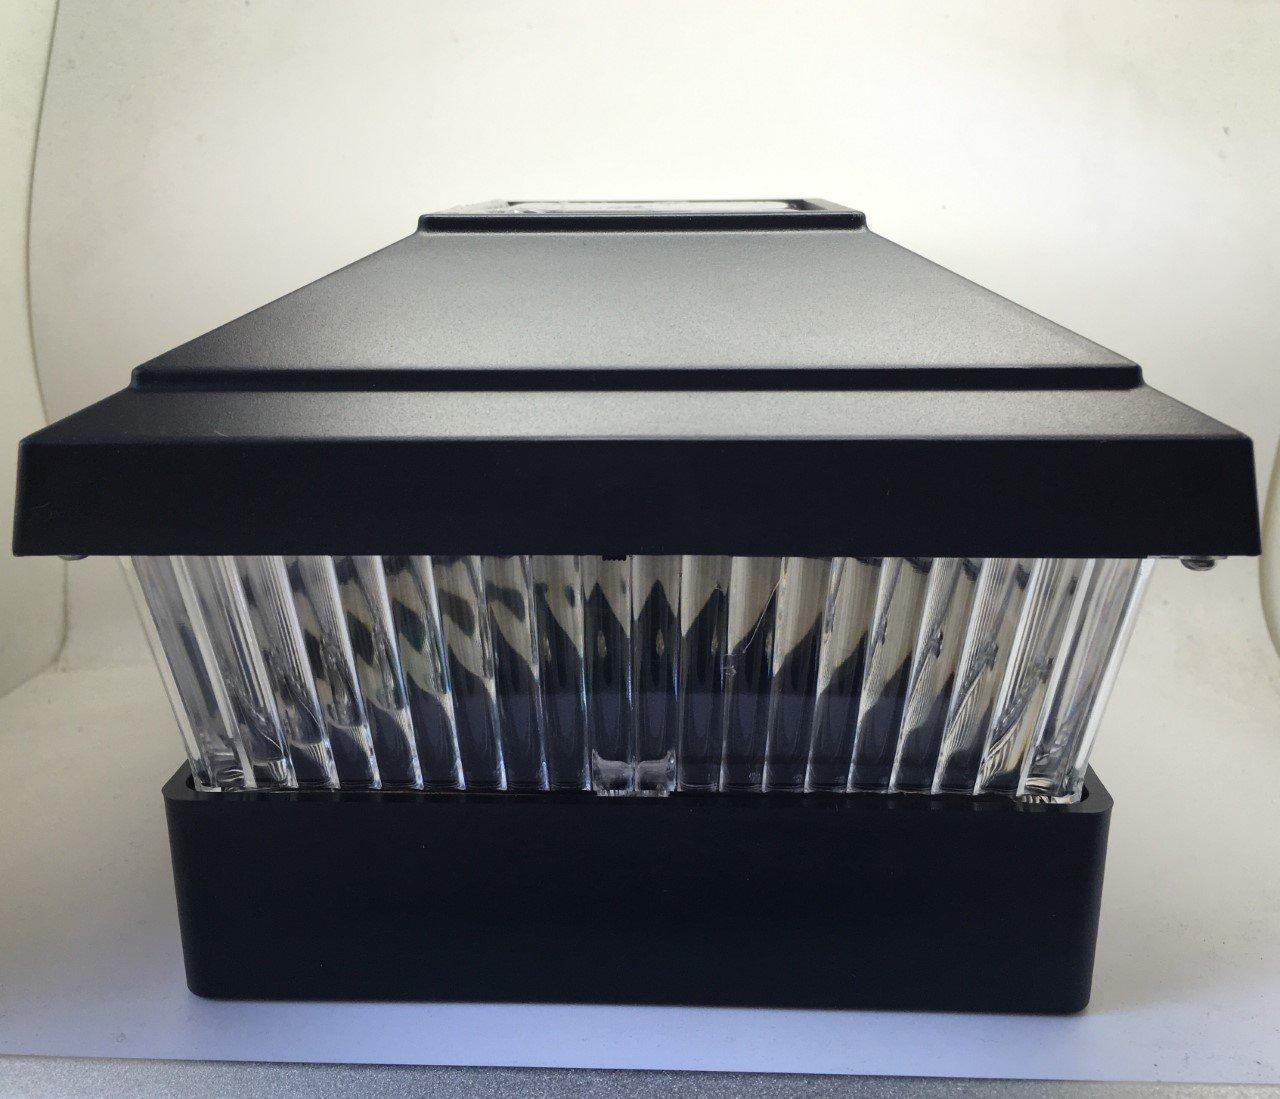 Set of 12 Solar Powered LED Light Plastic Black Square Post Fence With Inner Post Base Mount Dimension 5''x5'' (Item Number NH225BK)